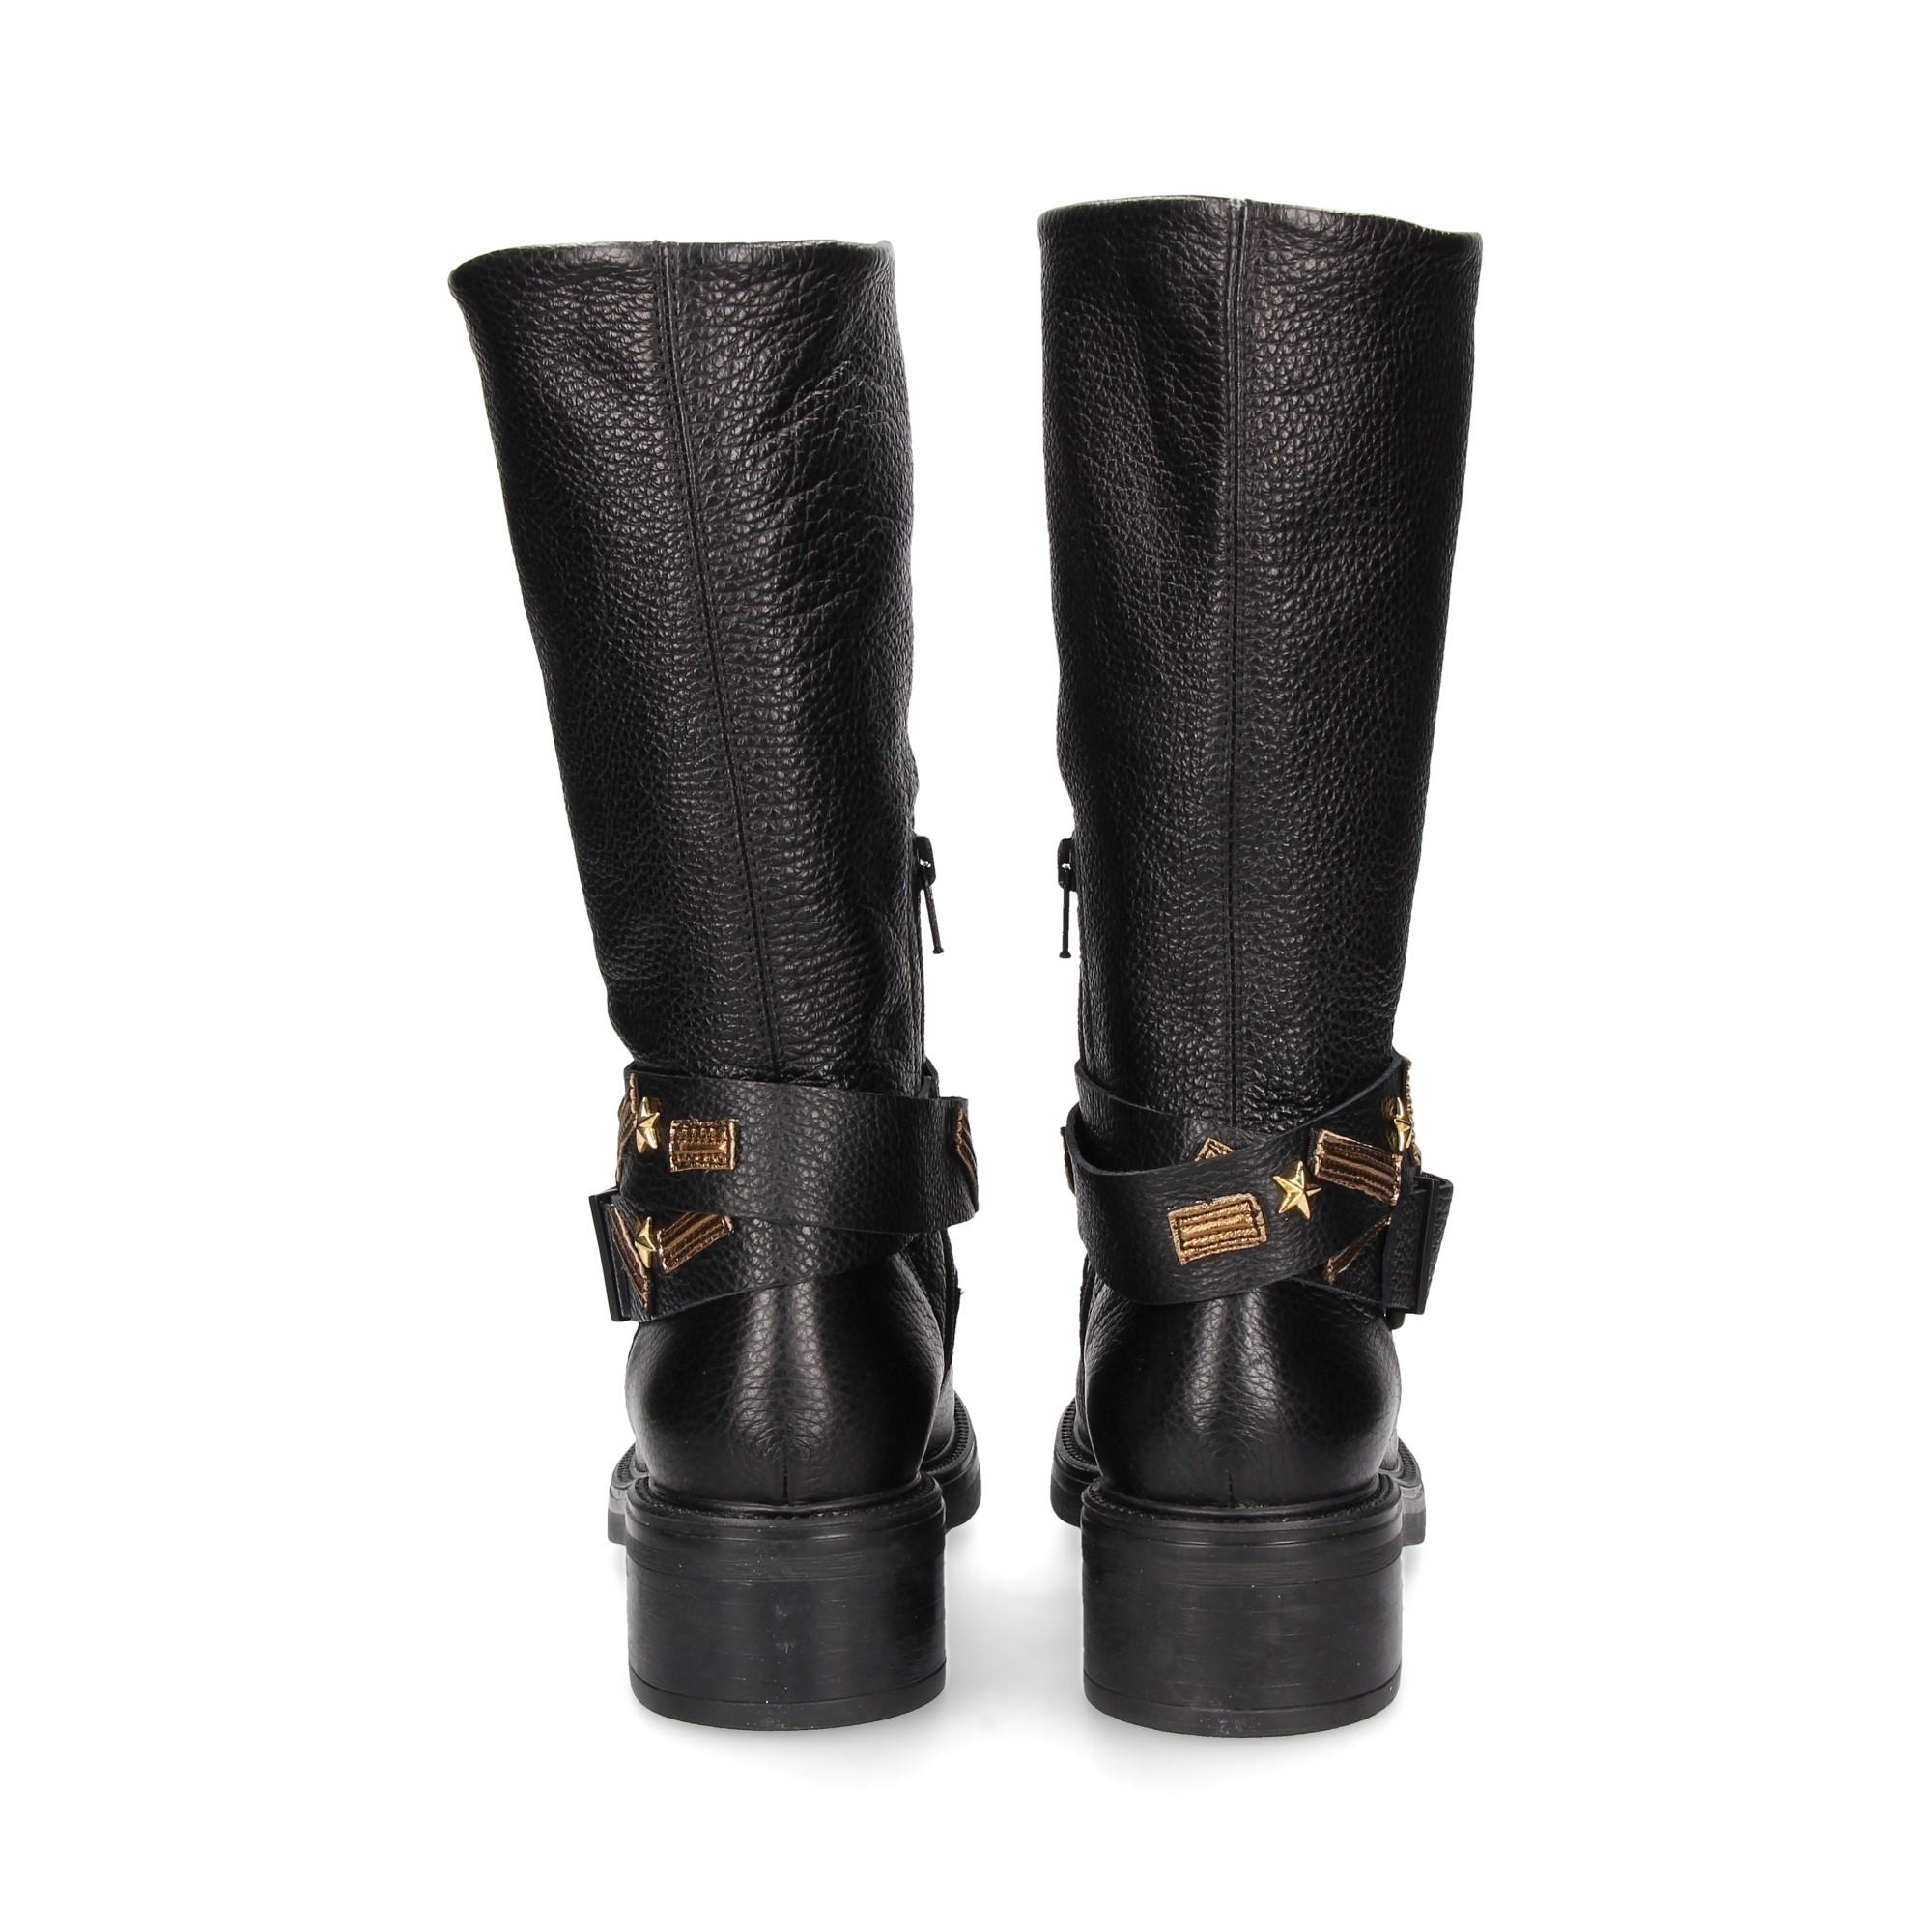 1-2-bota-cremallera-cinturon-piel-negro